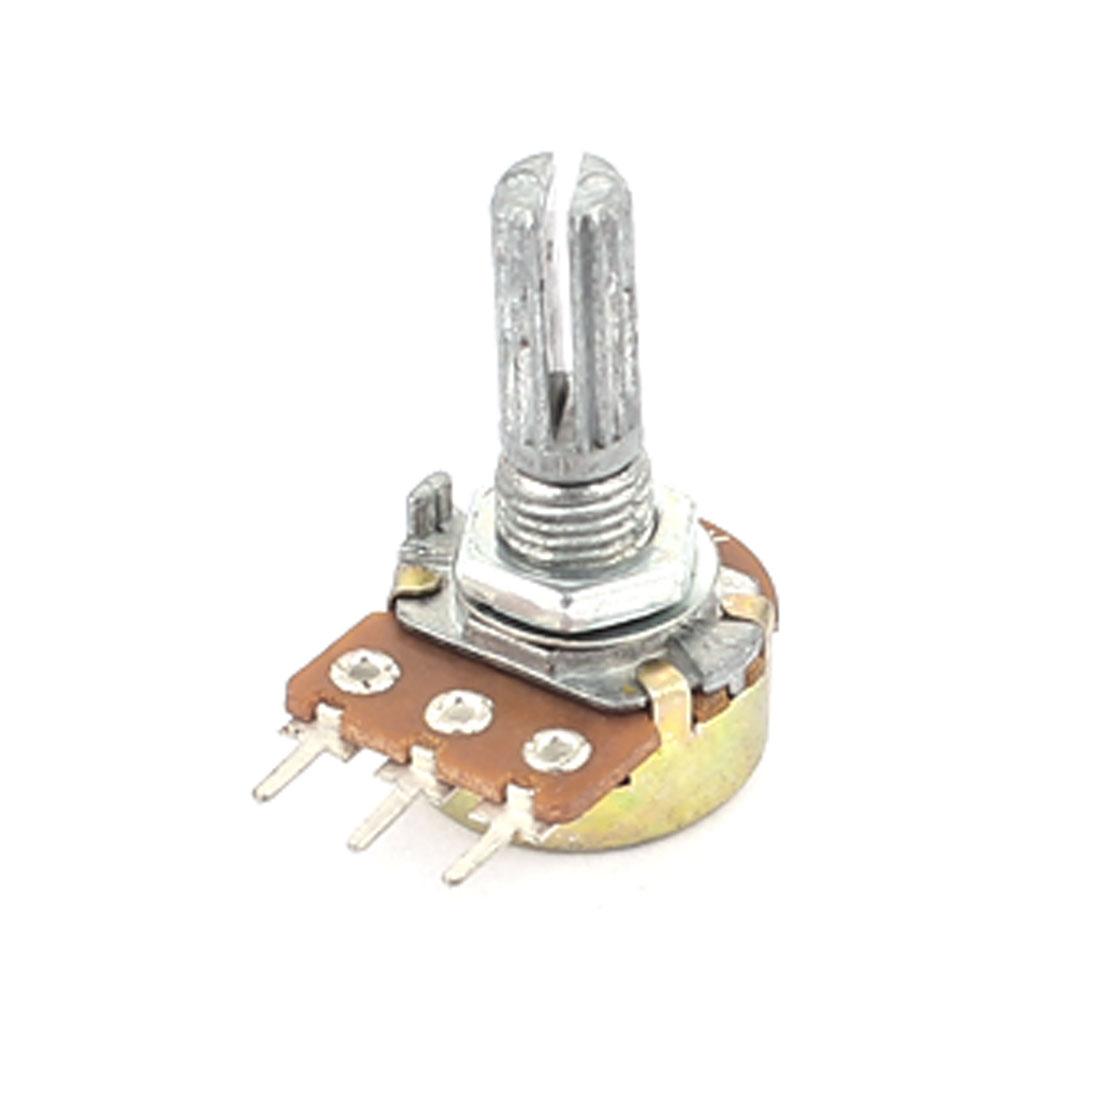 10K Ohm 3 Terminals Single Linear Audio Pot Rotary Taper Potentiometer